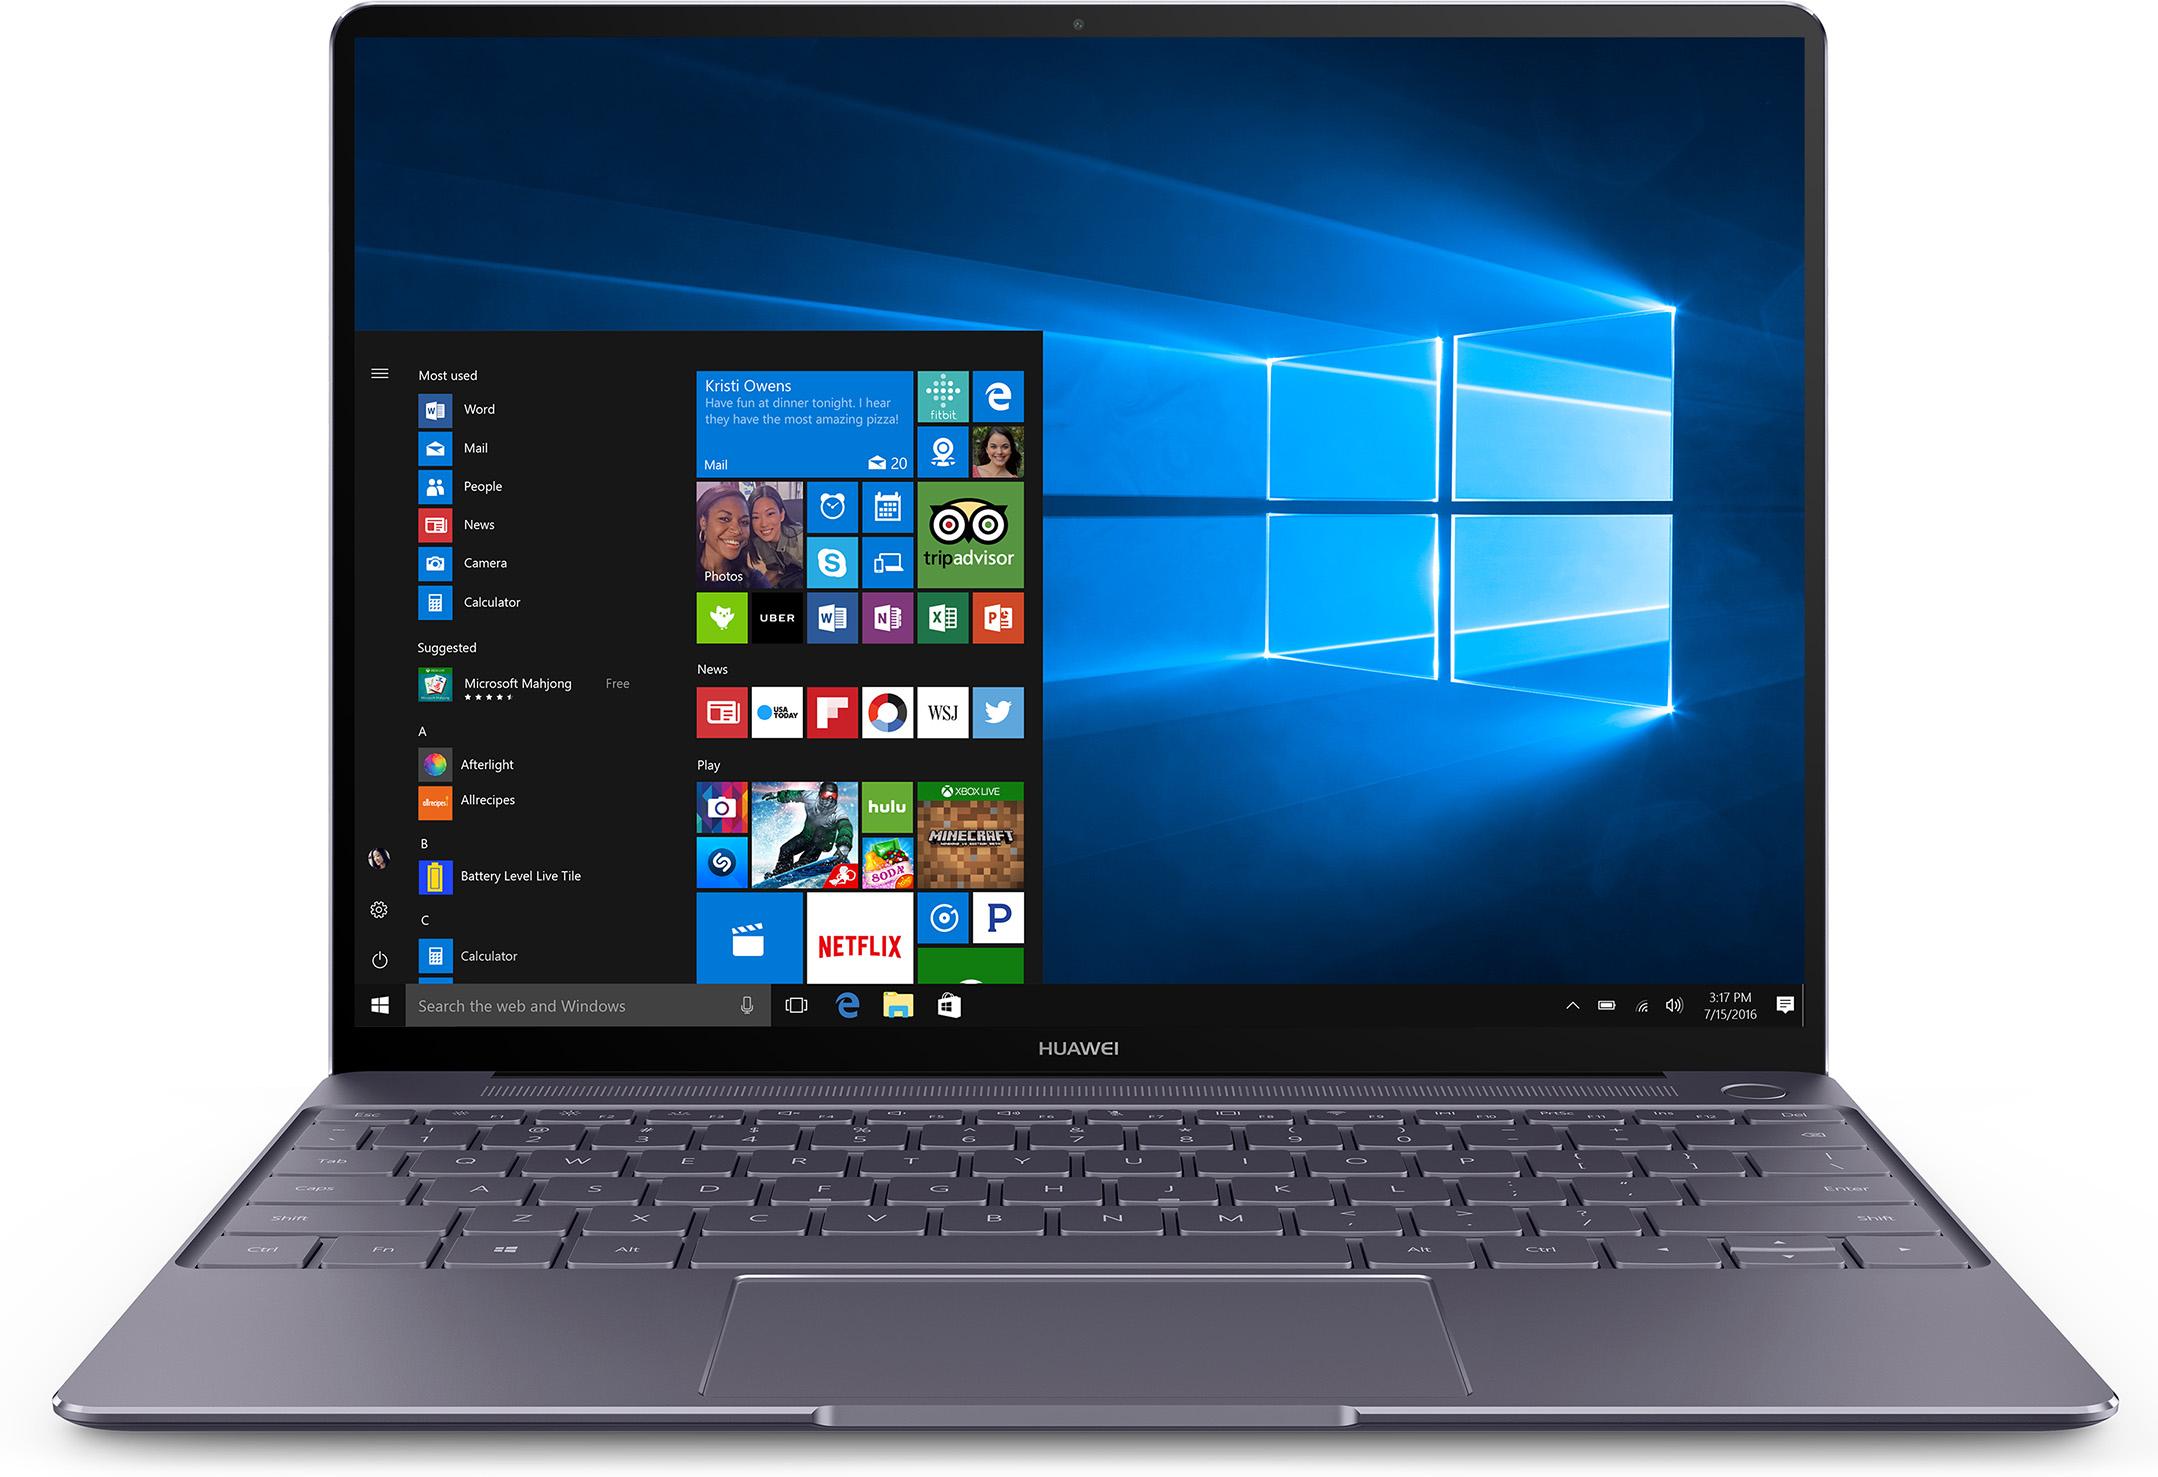 Huawei MateBook X 53018973 Laptop (Space Gray)